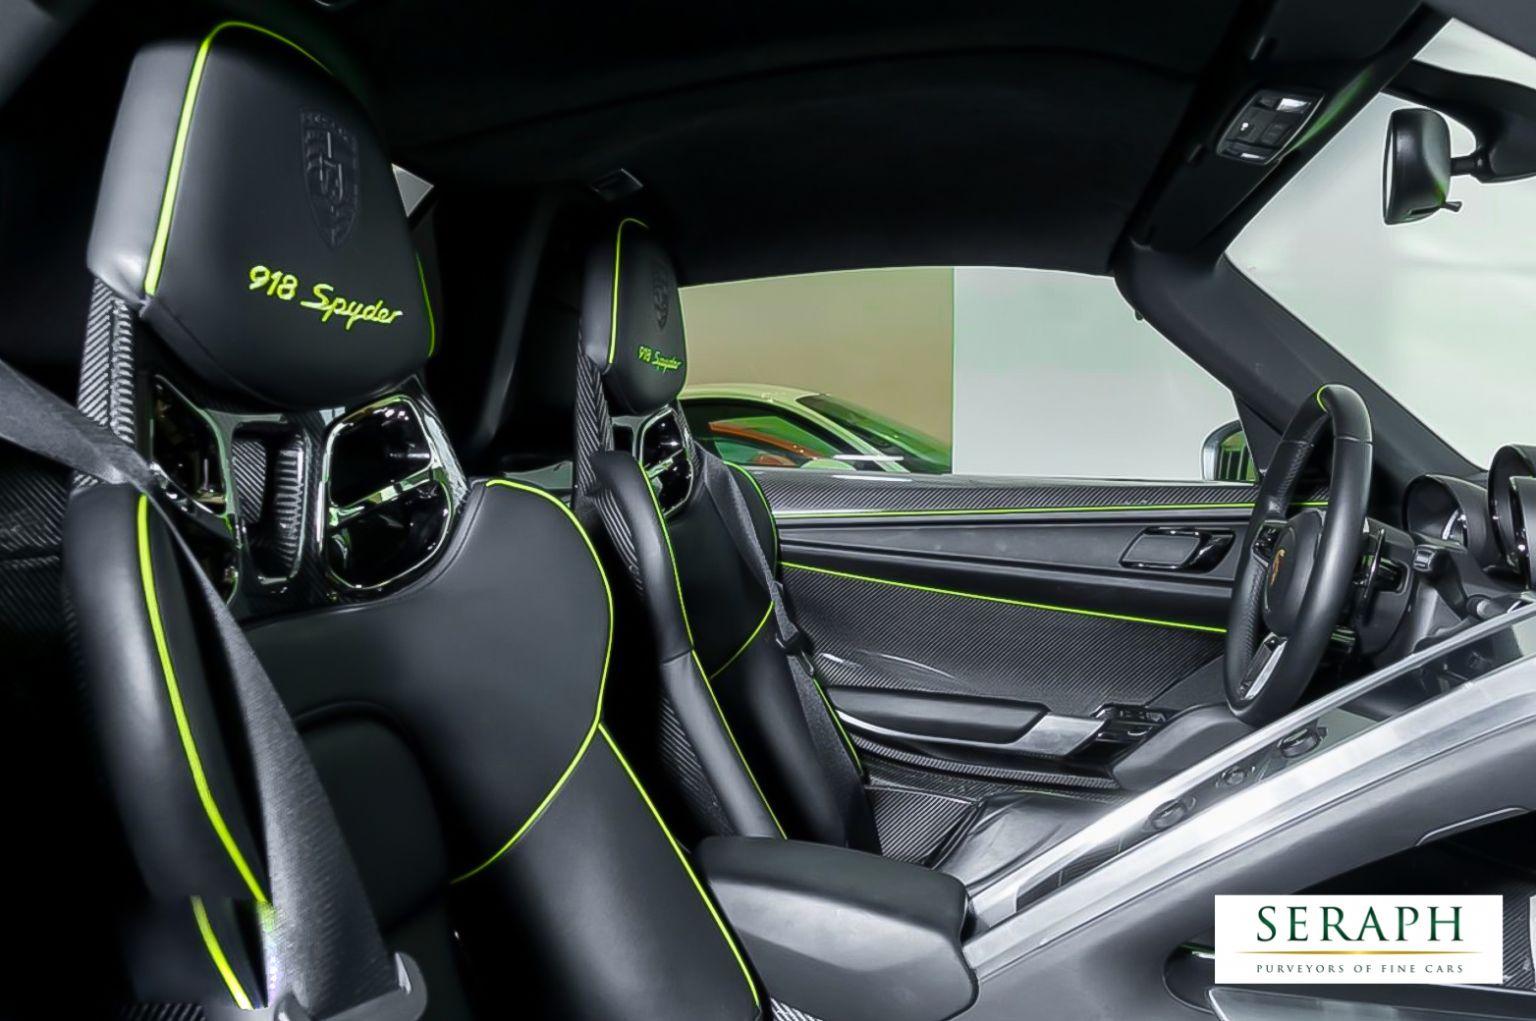 2016 Lamborghini Aventador SV Superveloce Roadster Vat Qualifying